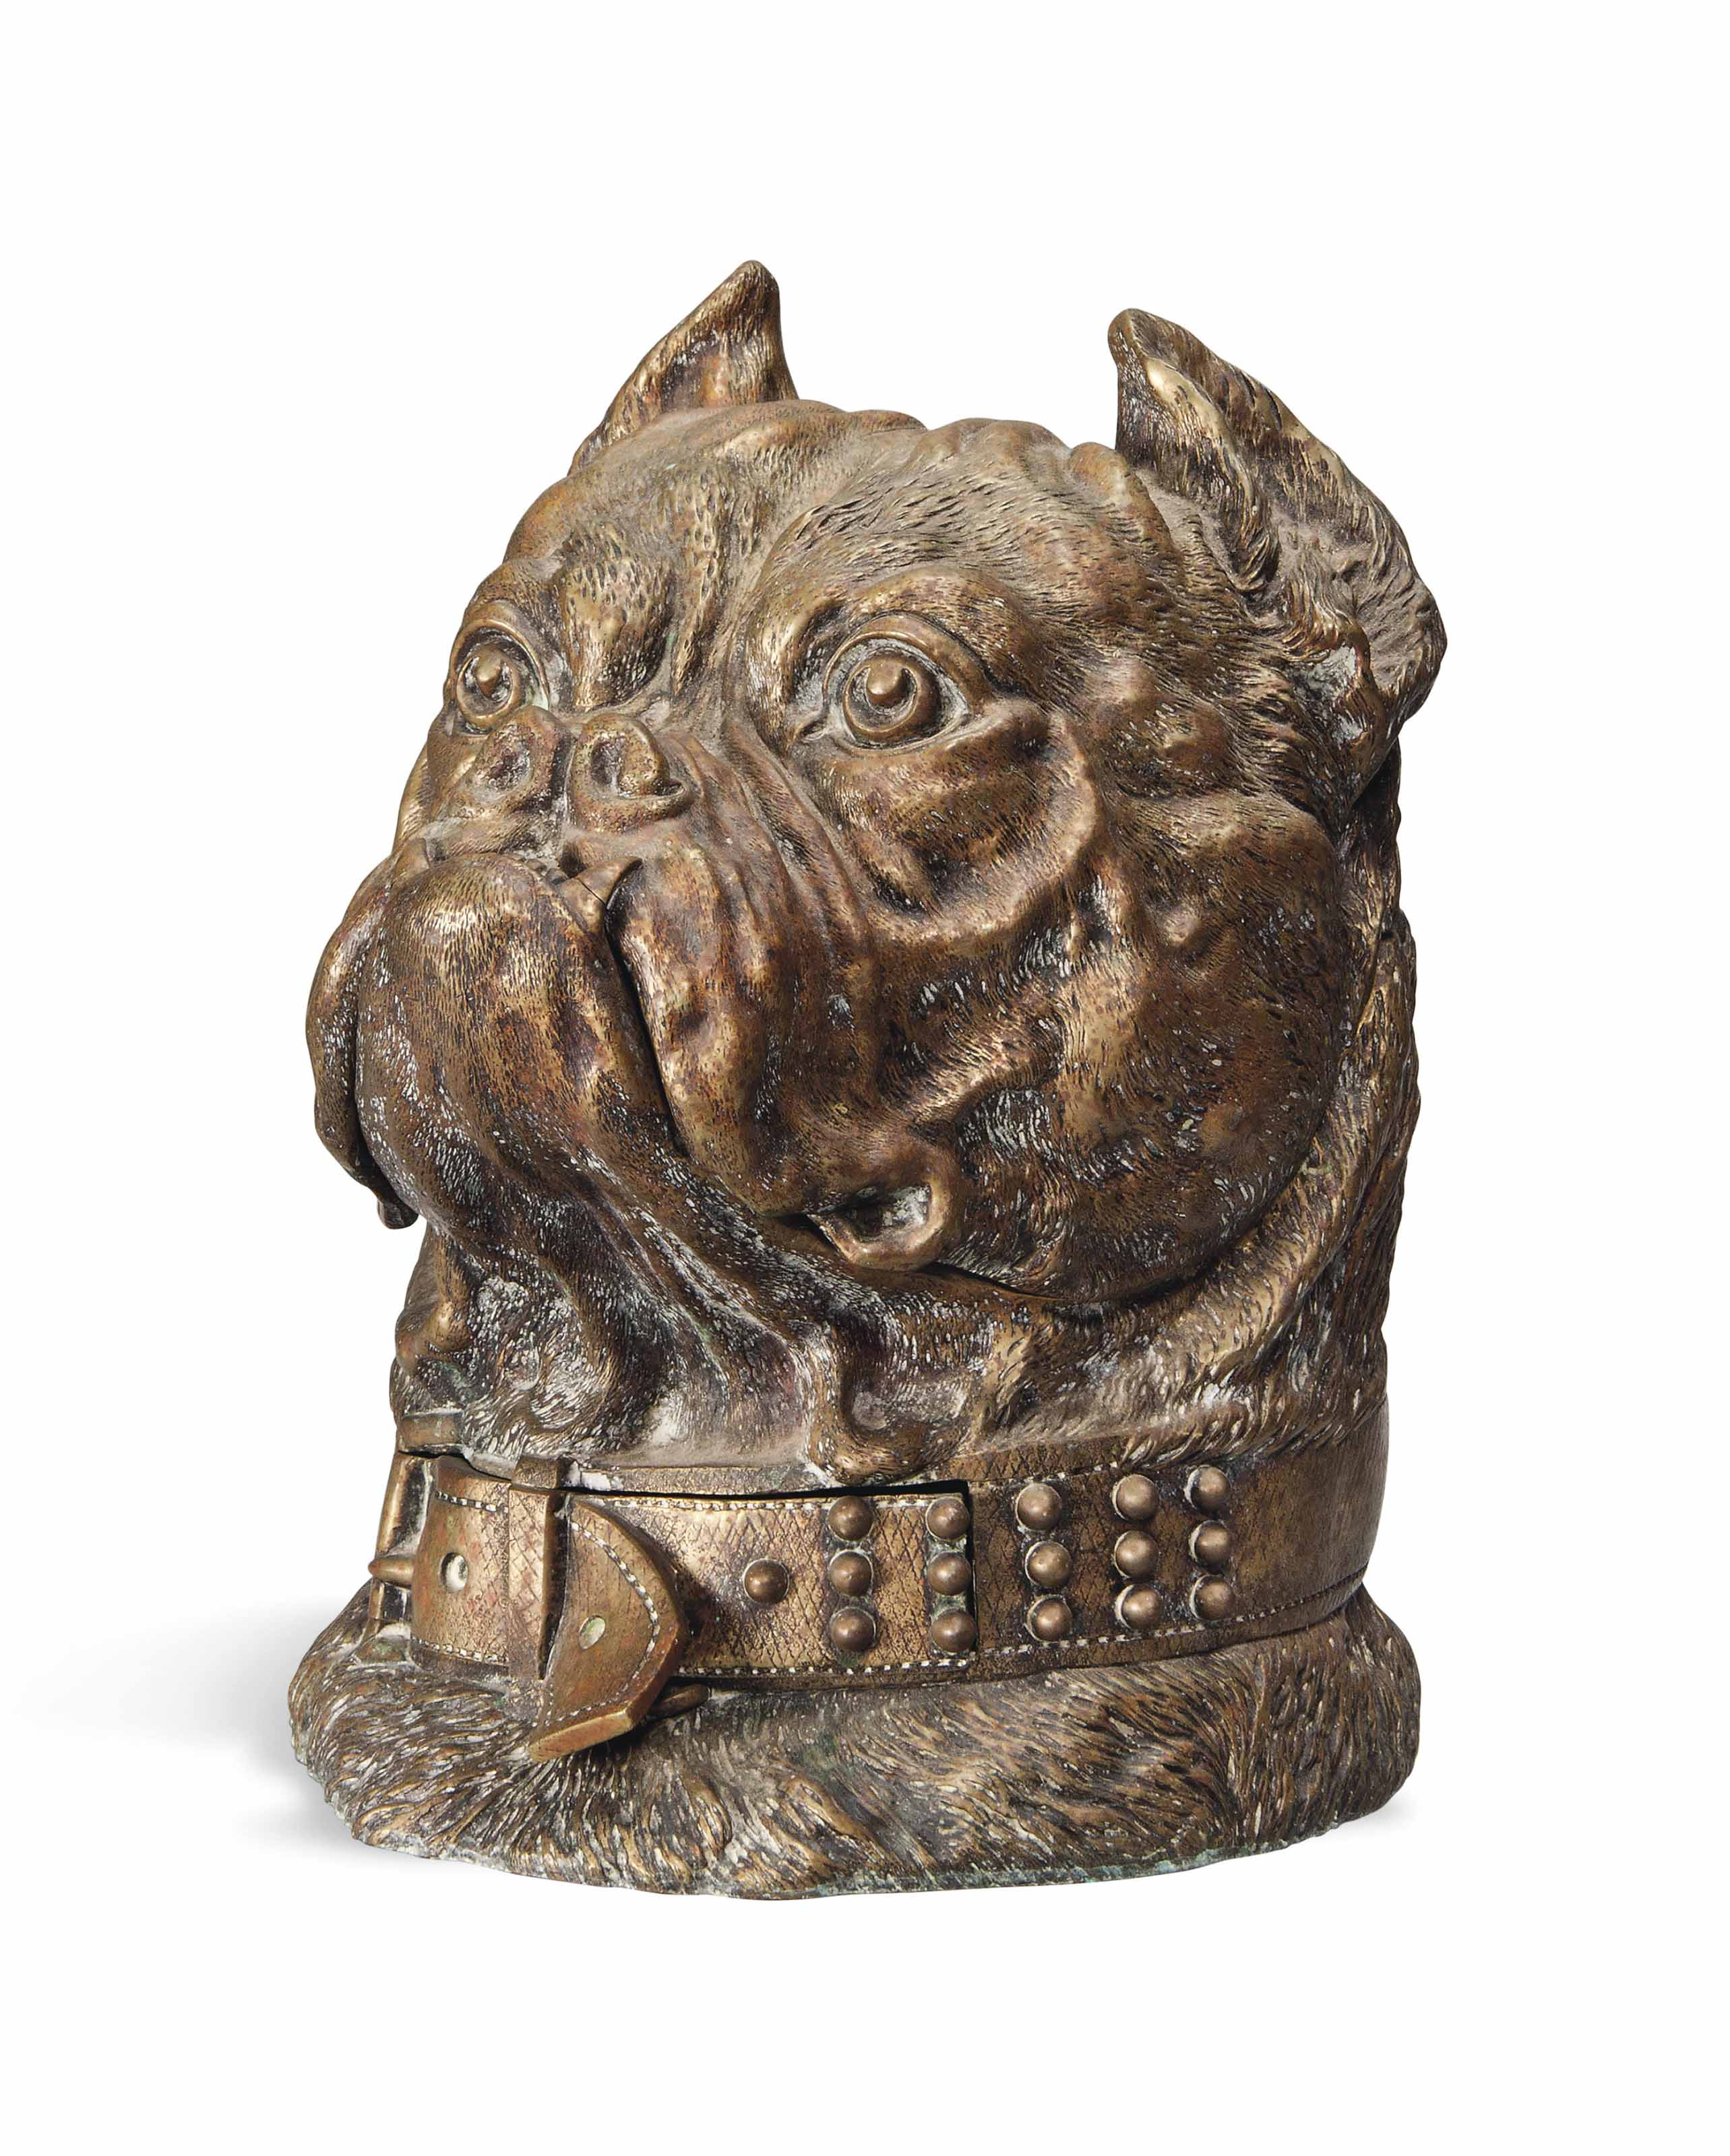 A LARGE AUSTRIAN BULL-DOG'S HE